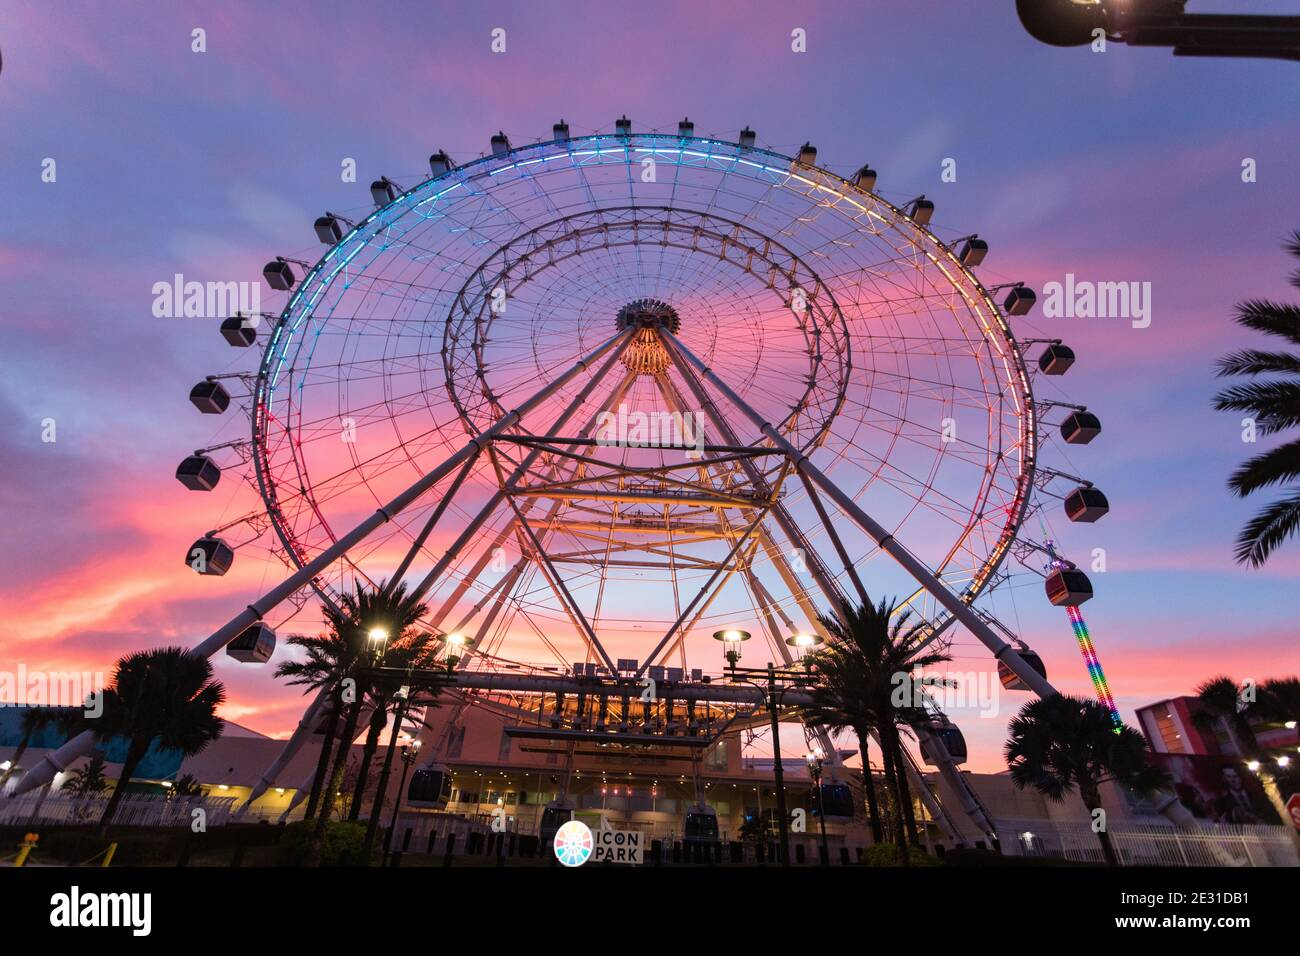 The Wheel at ICON Park Orlando at sunset Stock Photo